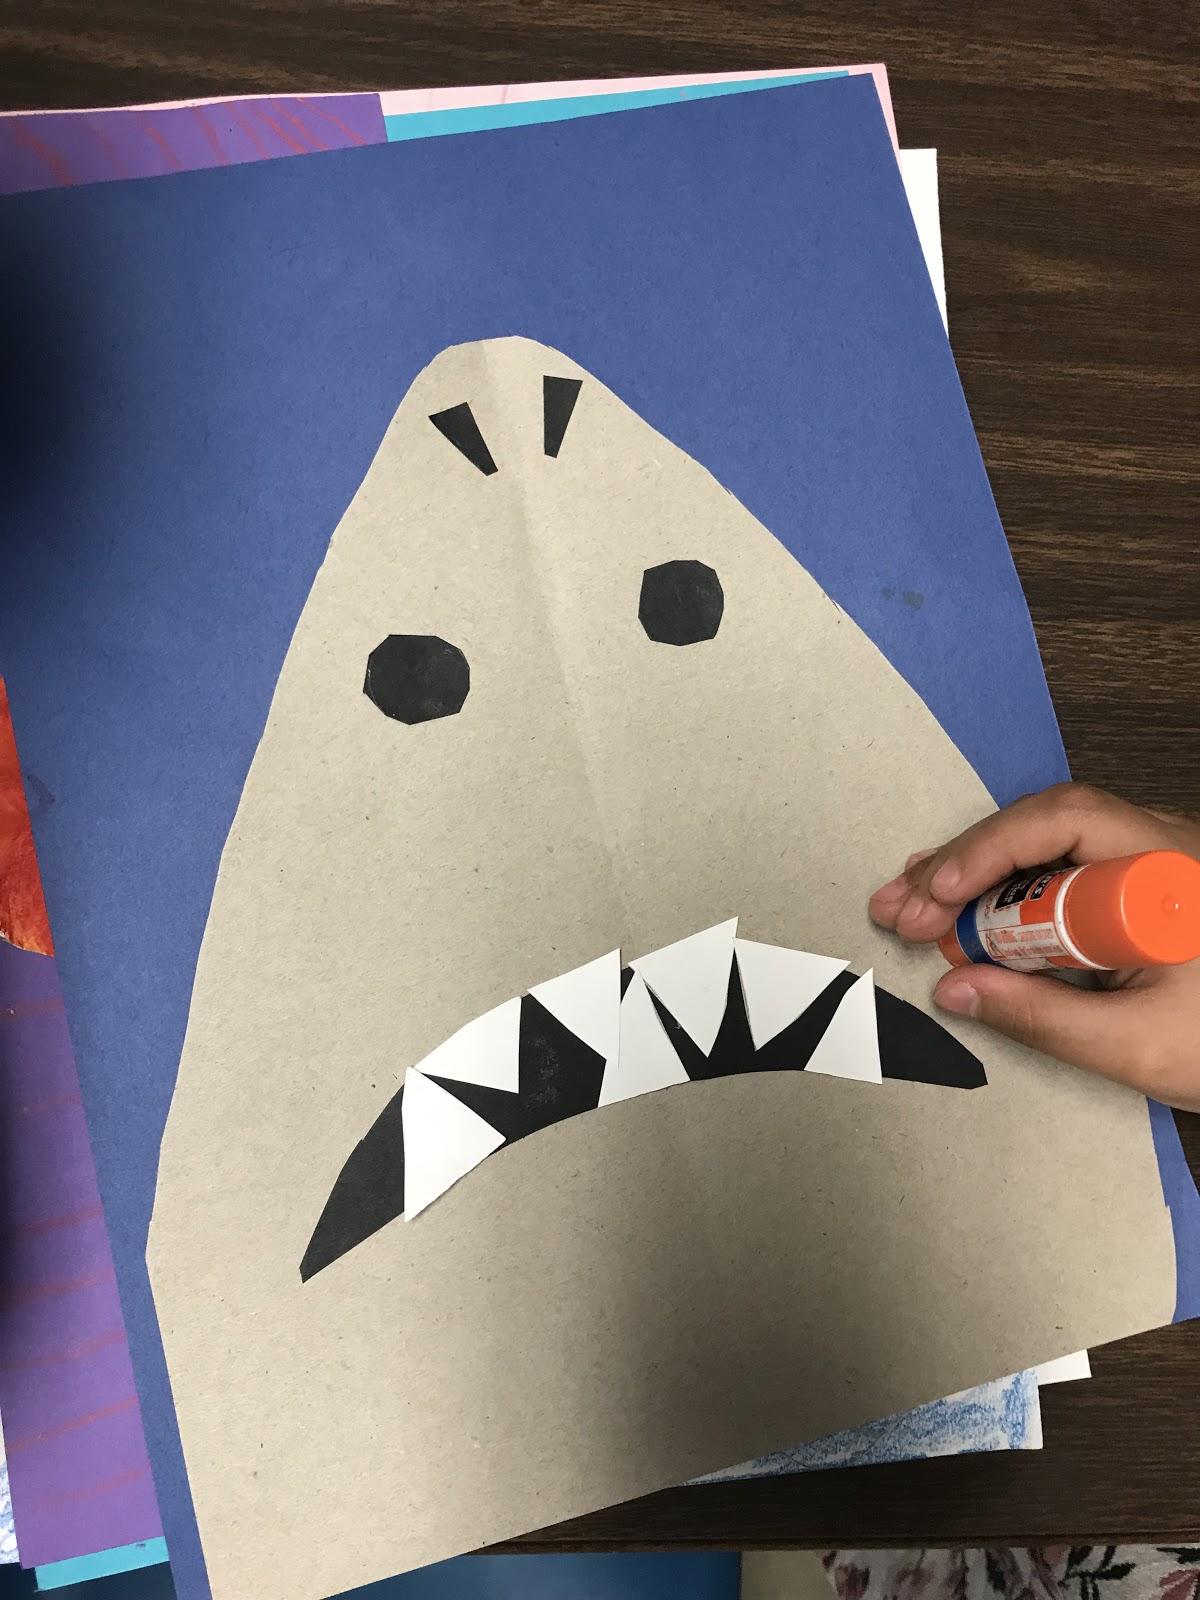 Elements Of The Art Room Kindergarten Symmetrical Sharks